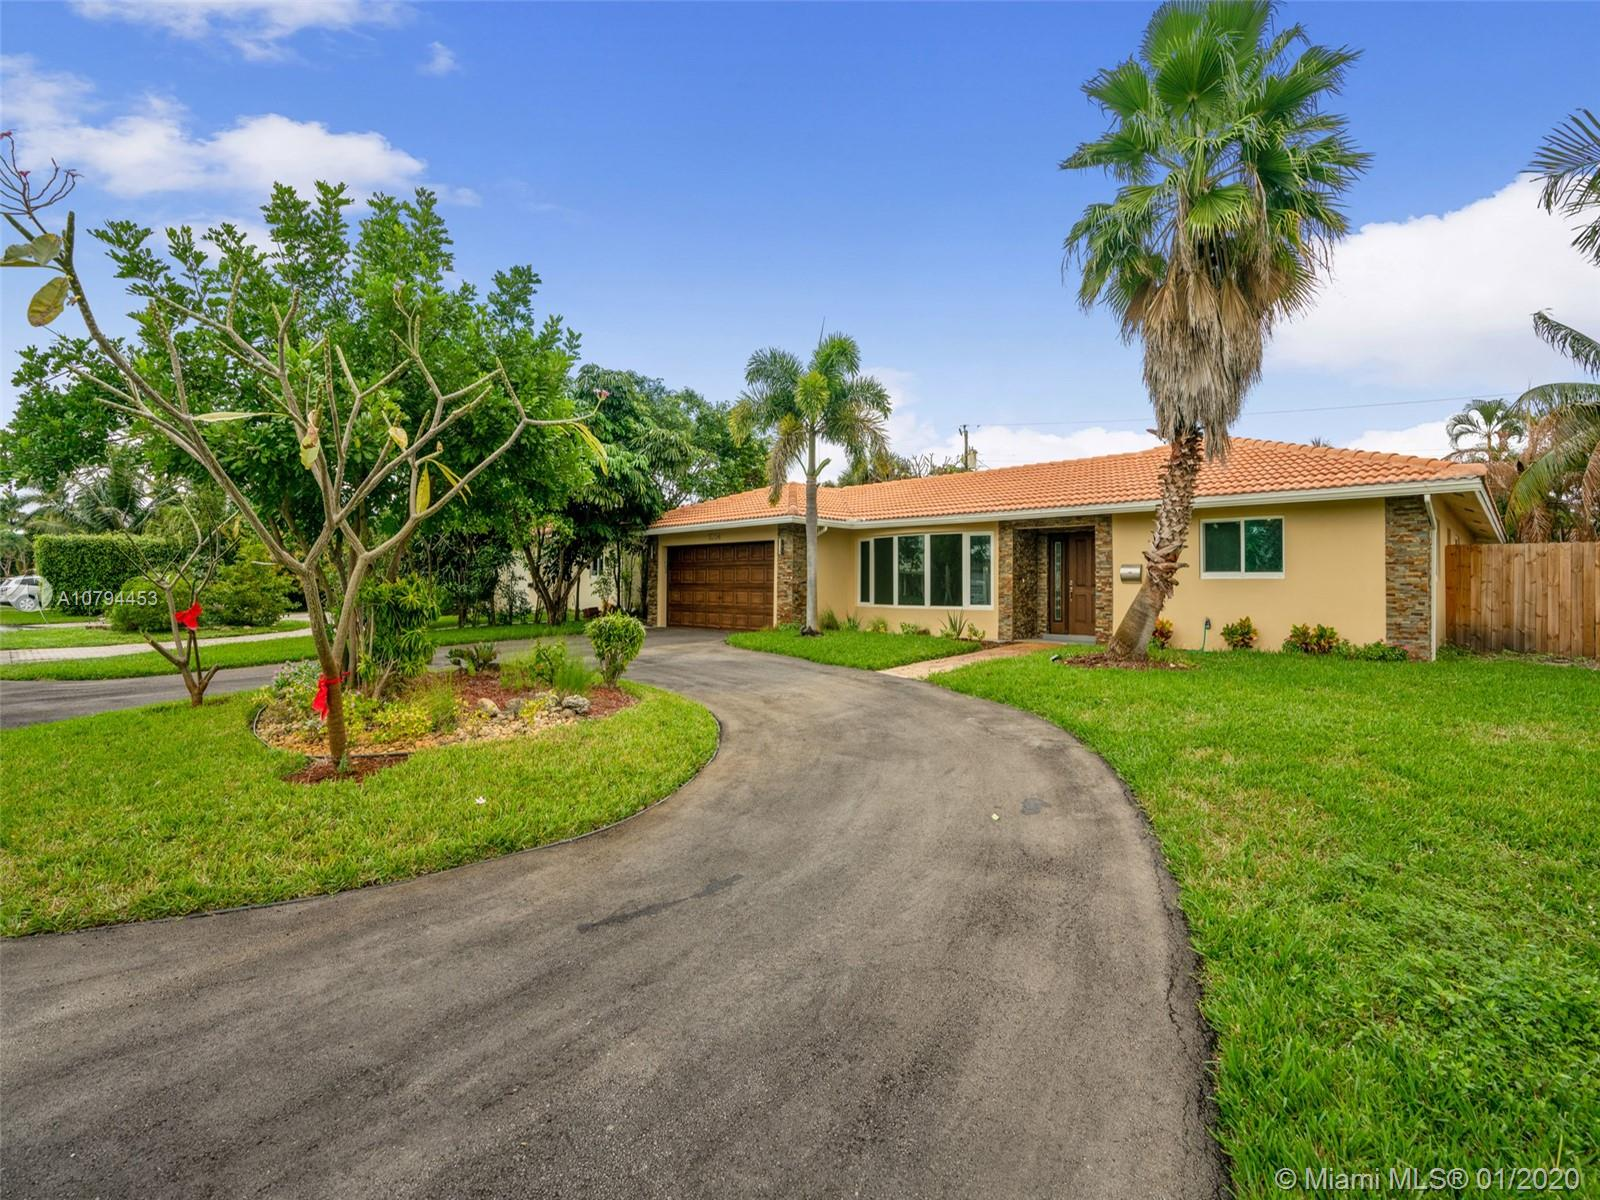 5754 NE 15th Ave, Fort Lauderdale, FL 33334